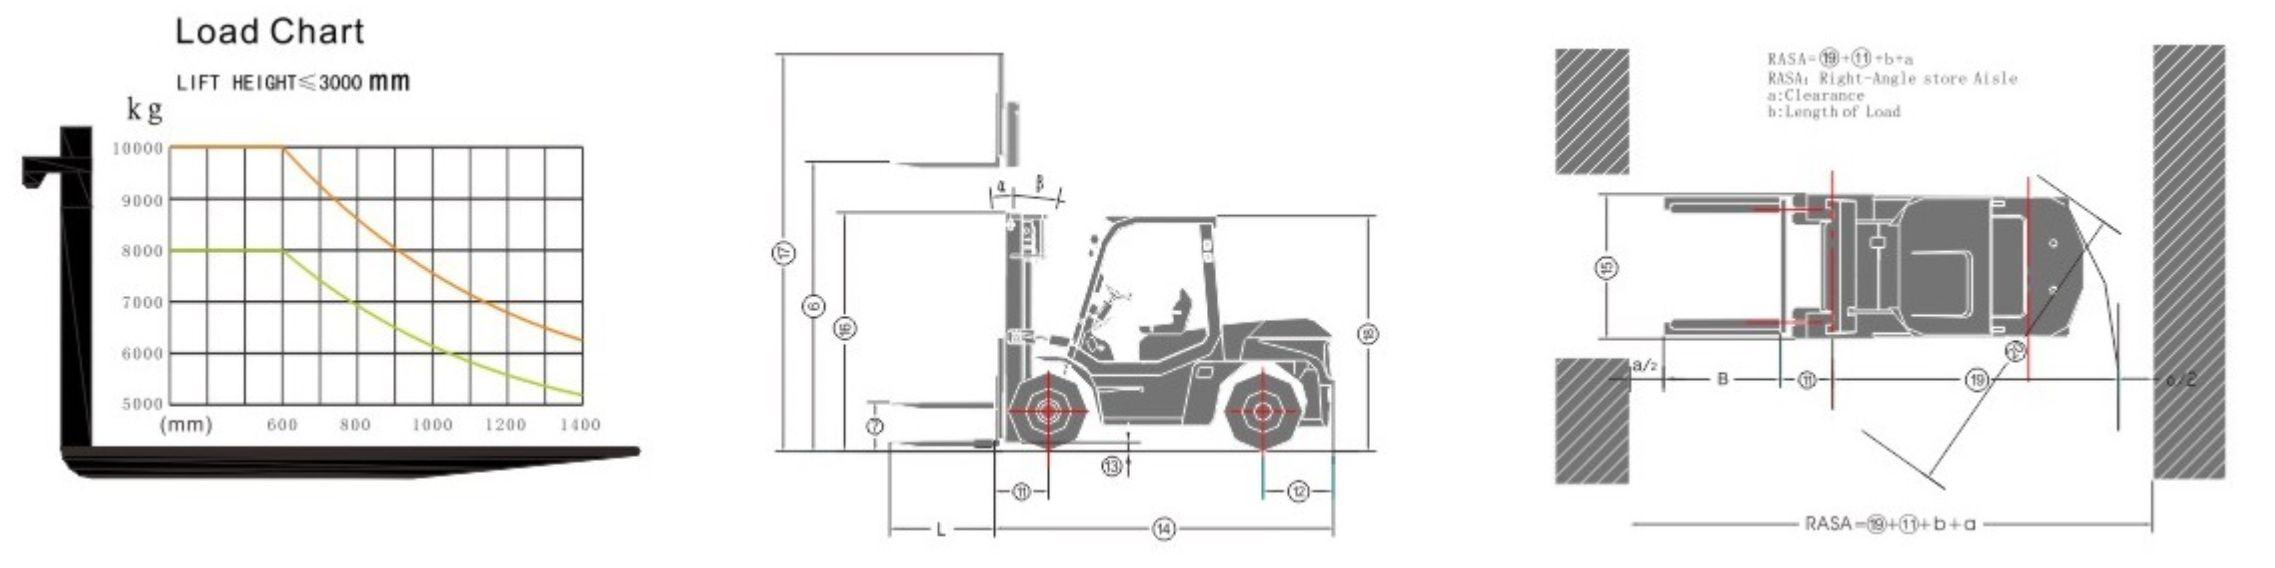 Load chart_diesel_8 - 12t